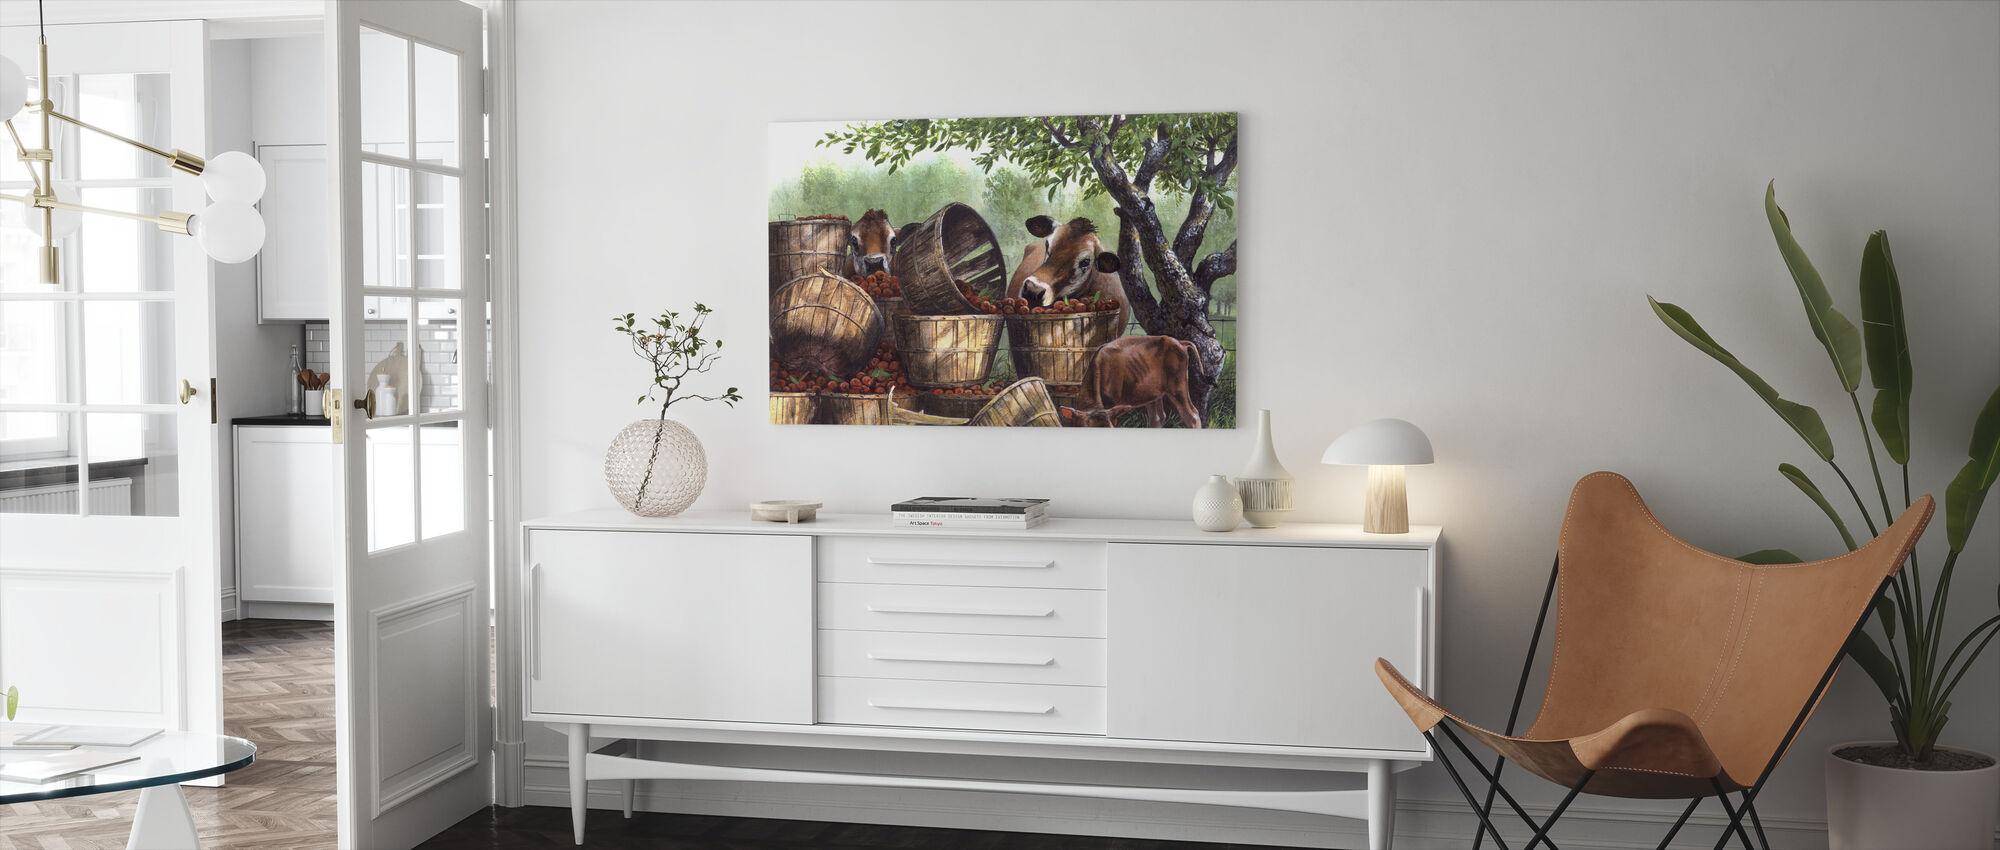 Raiding Apple Crop - Canvastavla - Vardagsrum